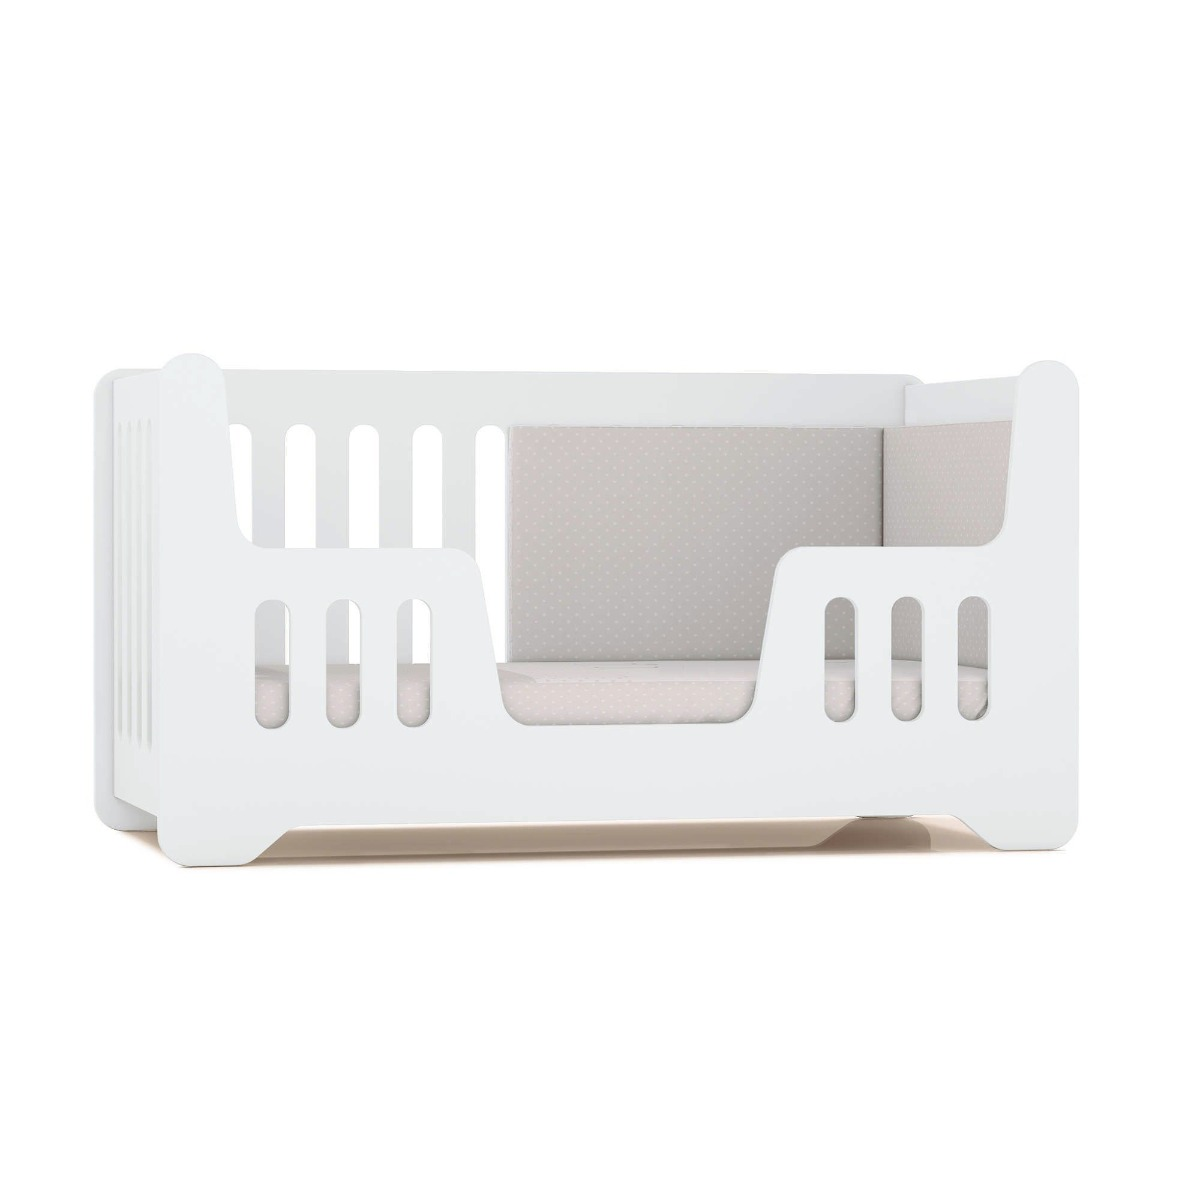 Patut bebe Home Concept, Alb imagine